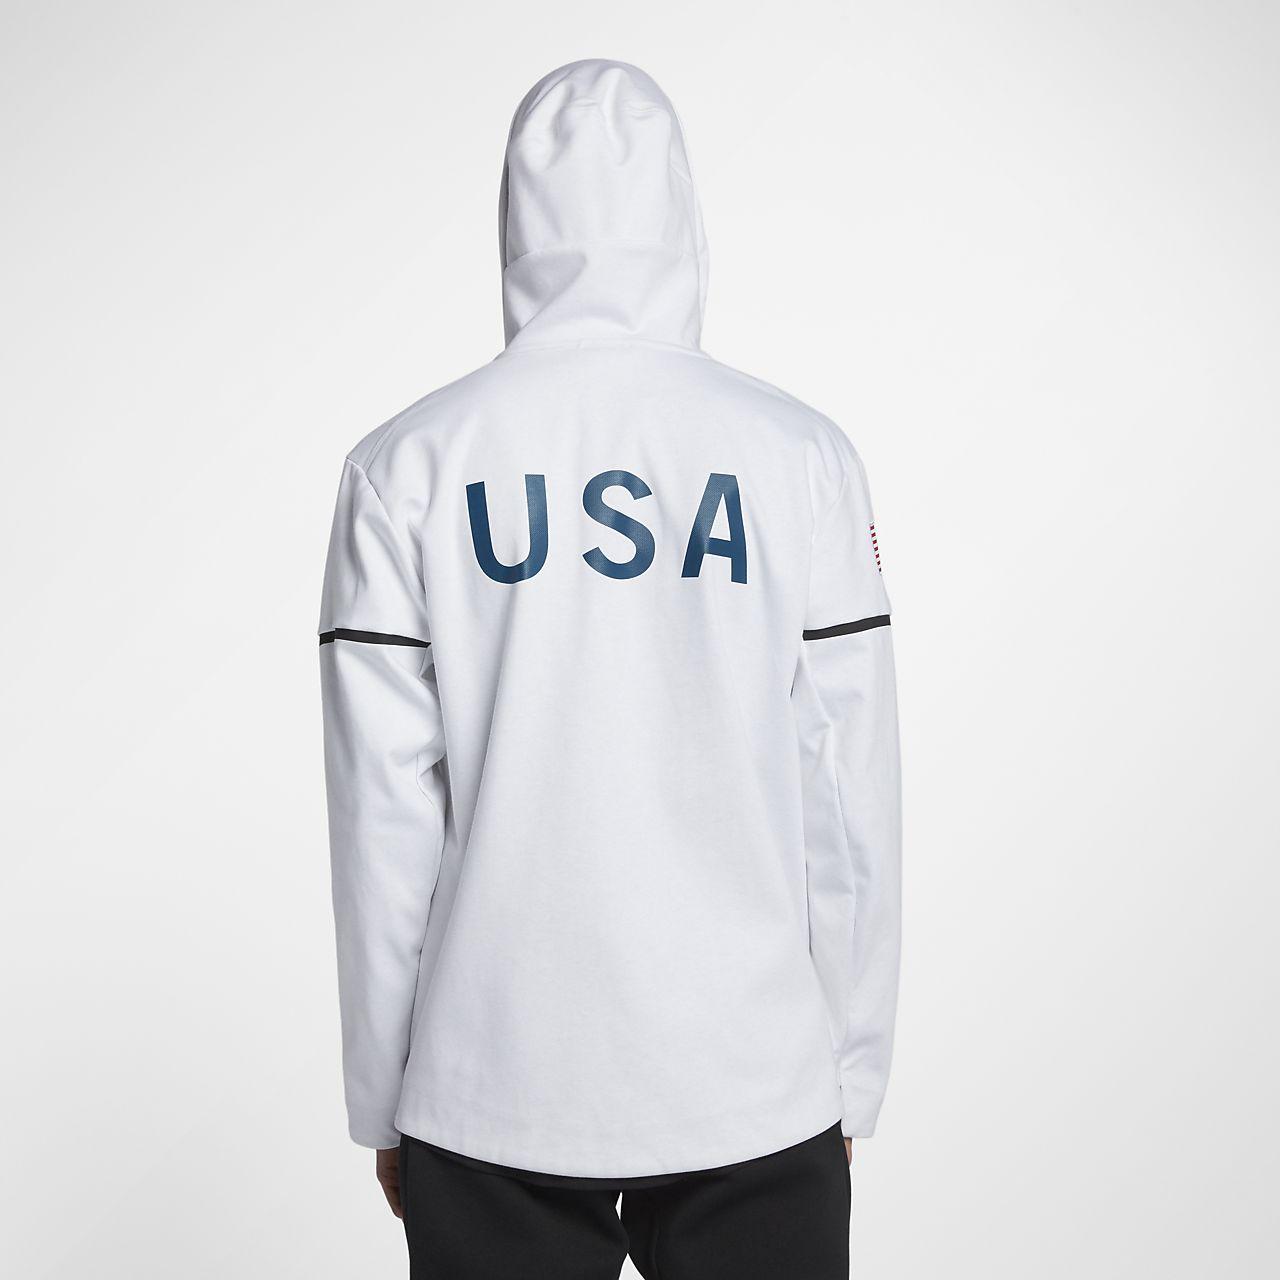 ... Nike Tech Fleece Team USA Windrunner Men's Jacket